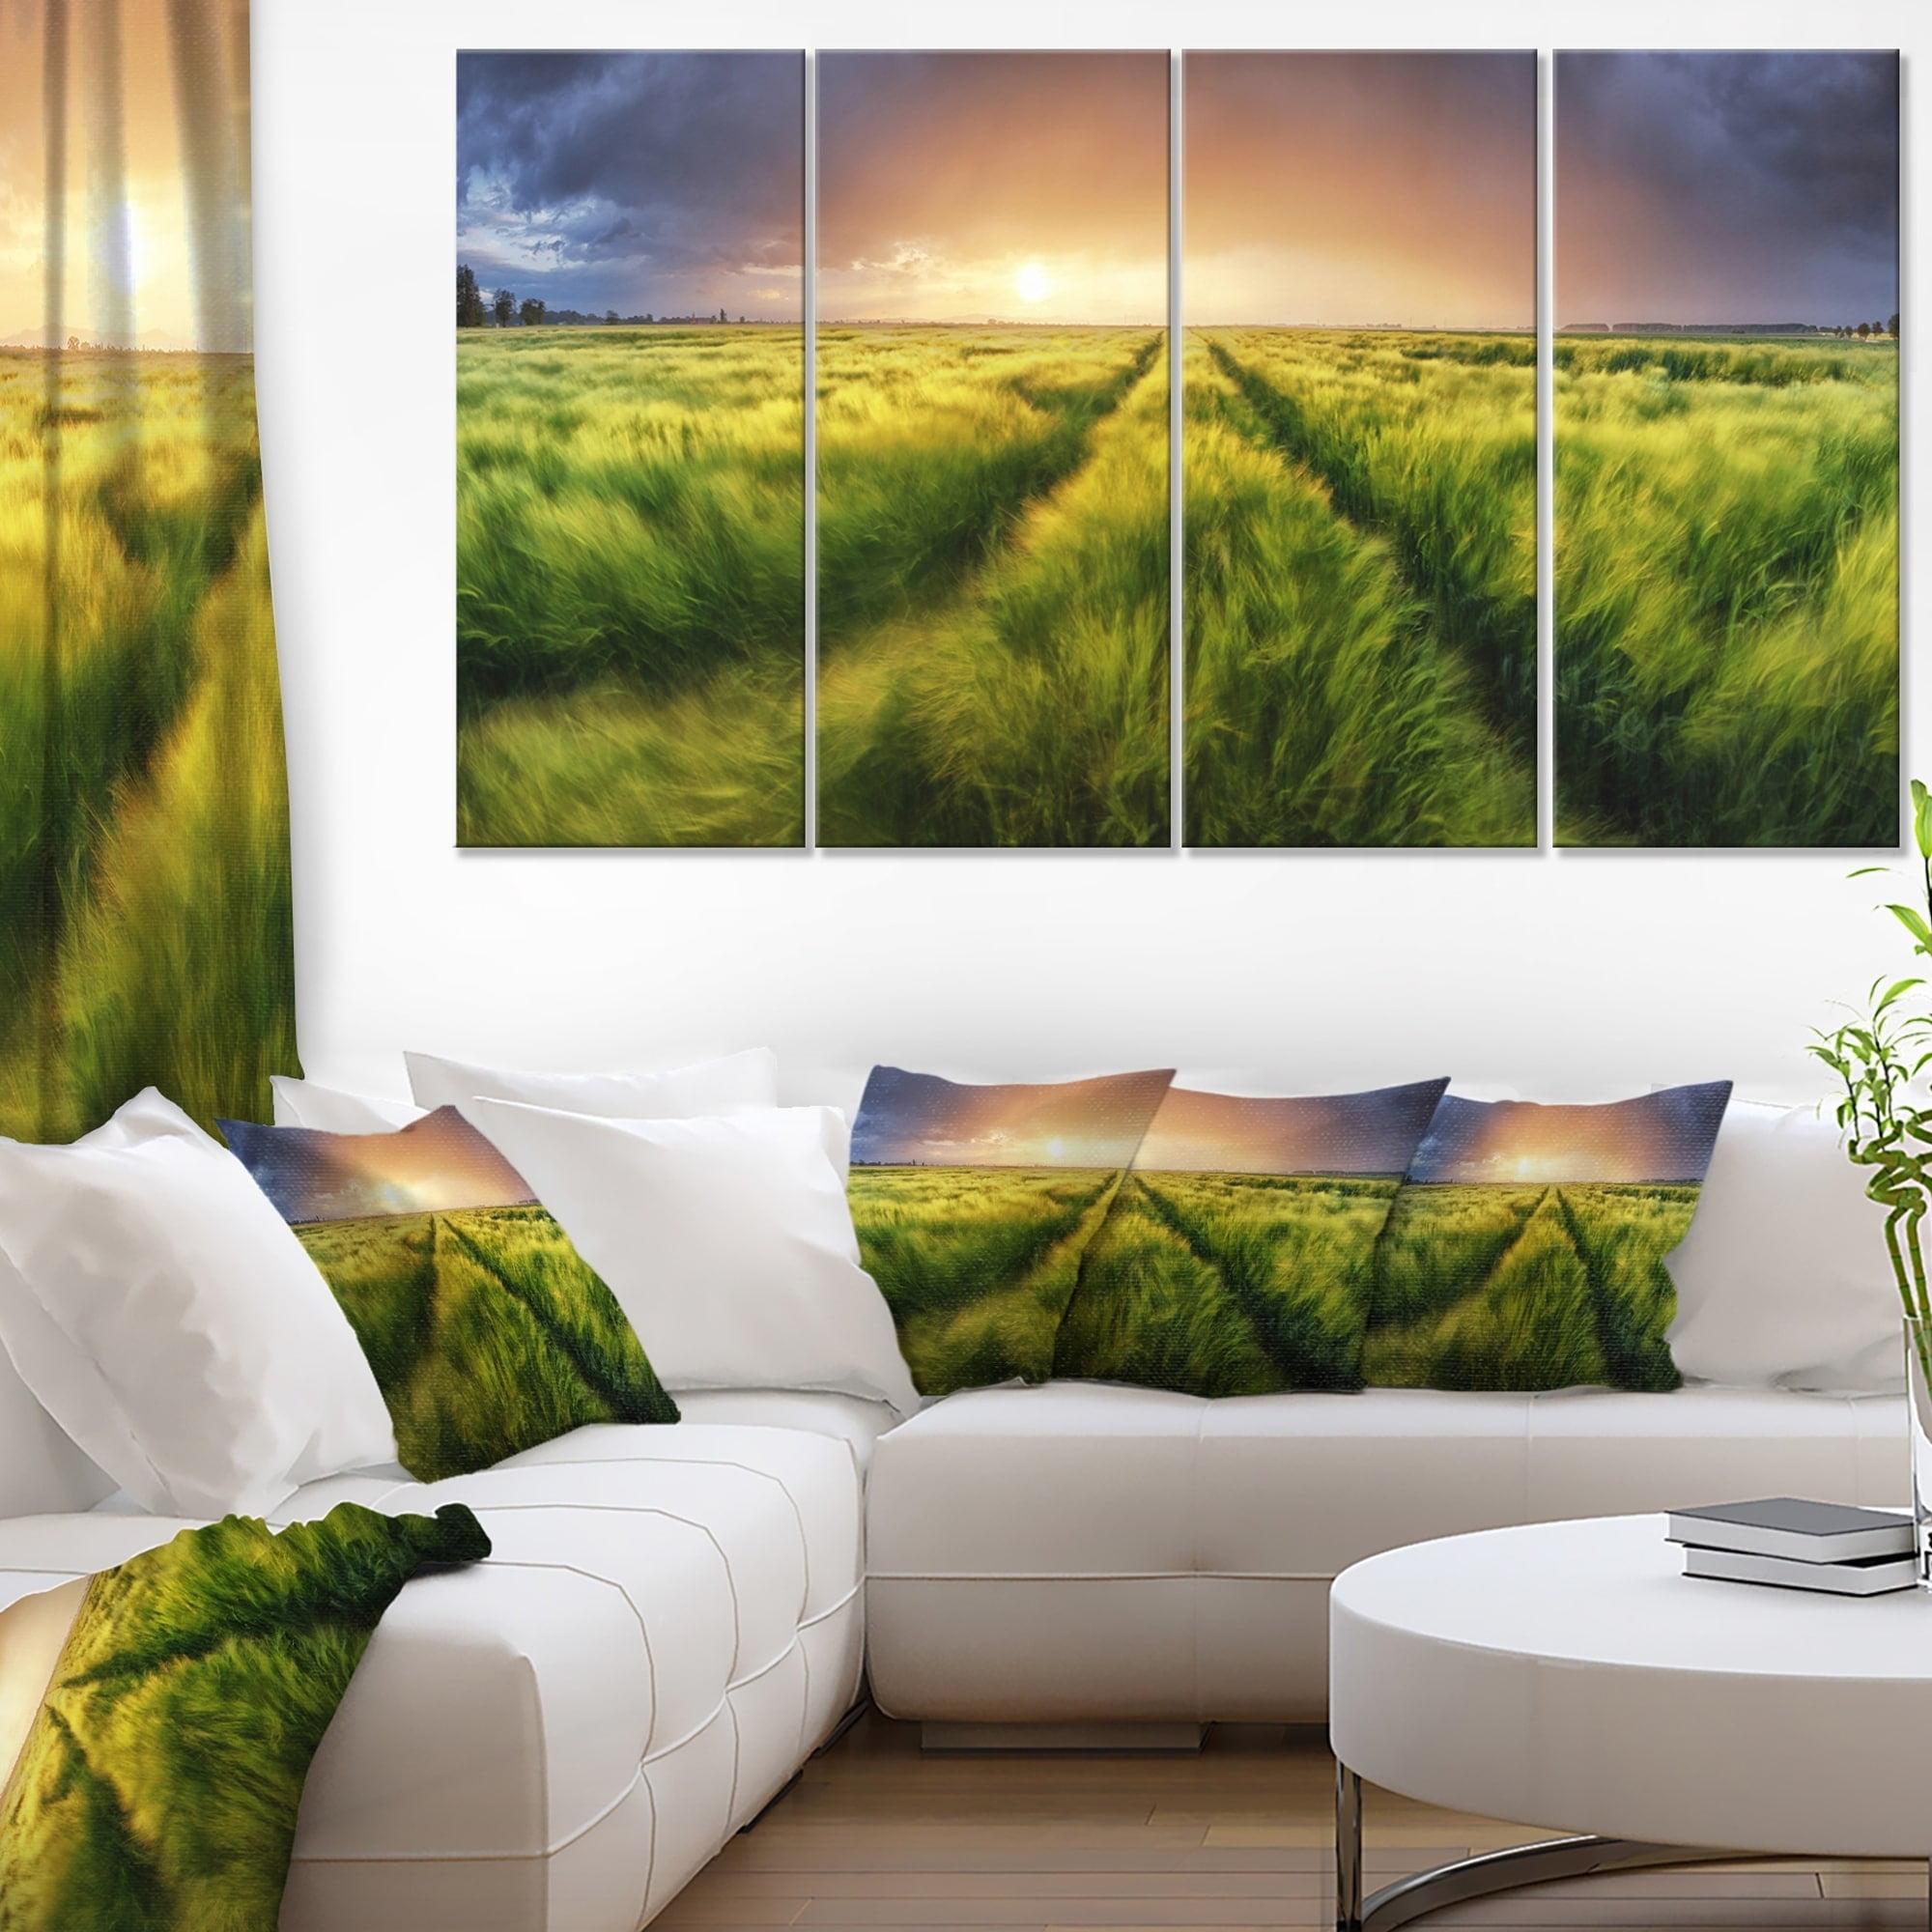 Design Art Storm And Light On Meadow Landscape Artwork Canvas Green 60 In Wide X 32 In High 5 Panels Diamond Shape Walmart Com Walmart Com